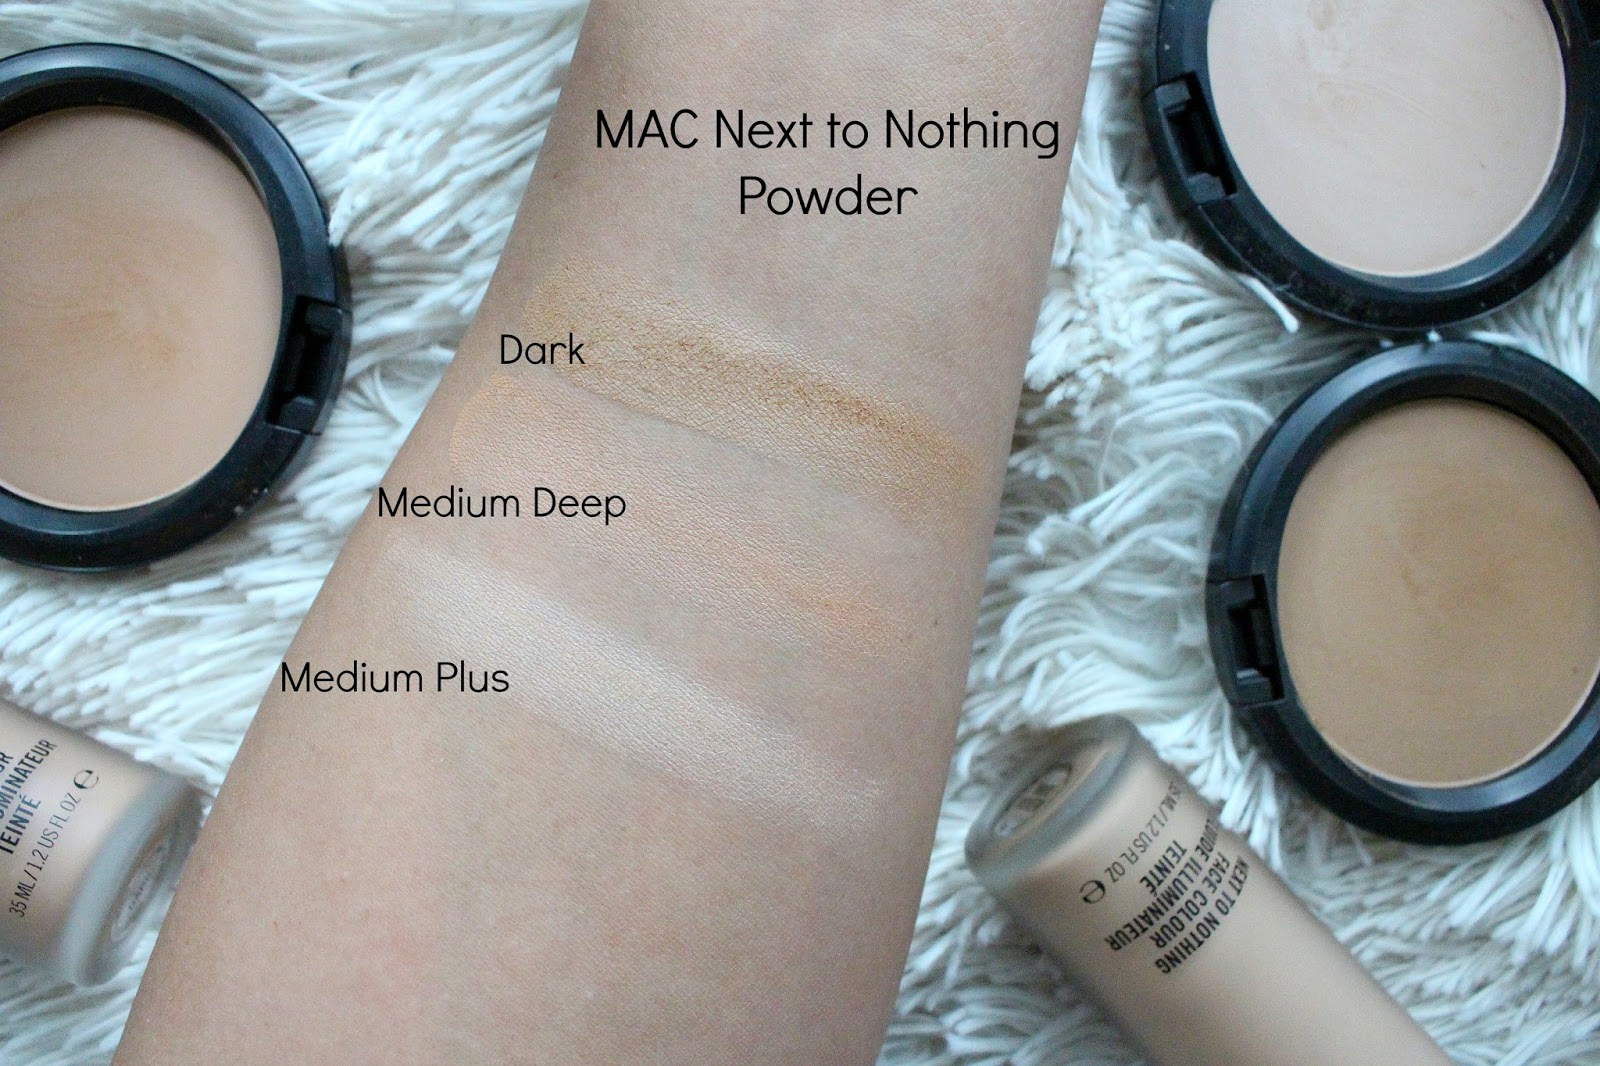 Mac next to nothing powder review